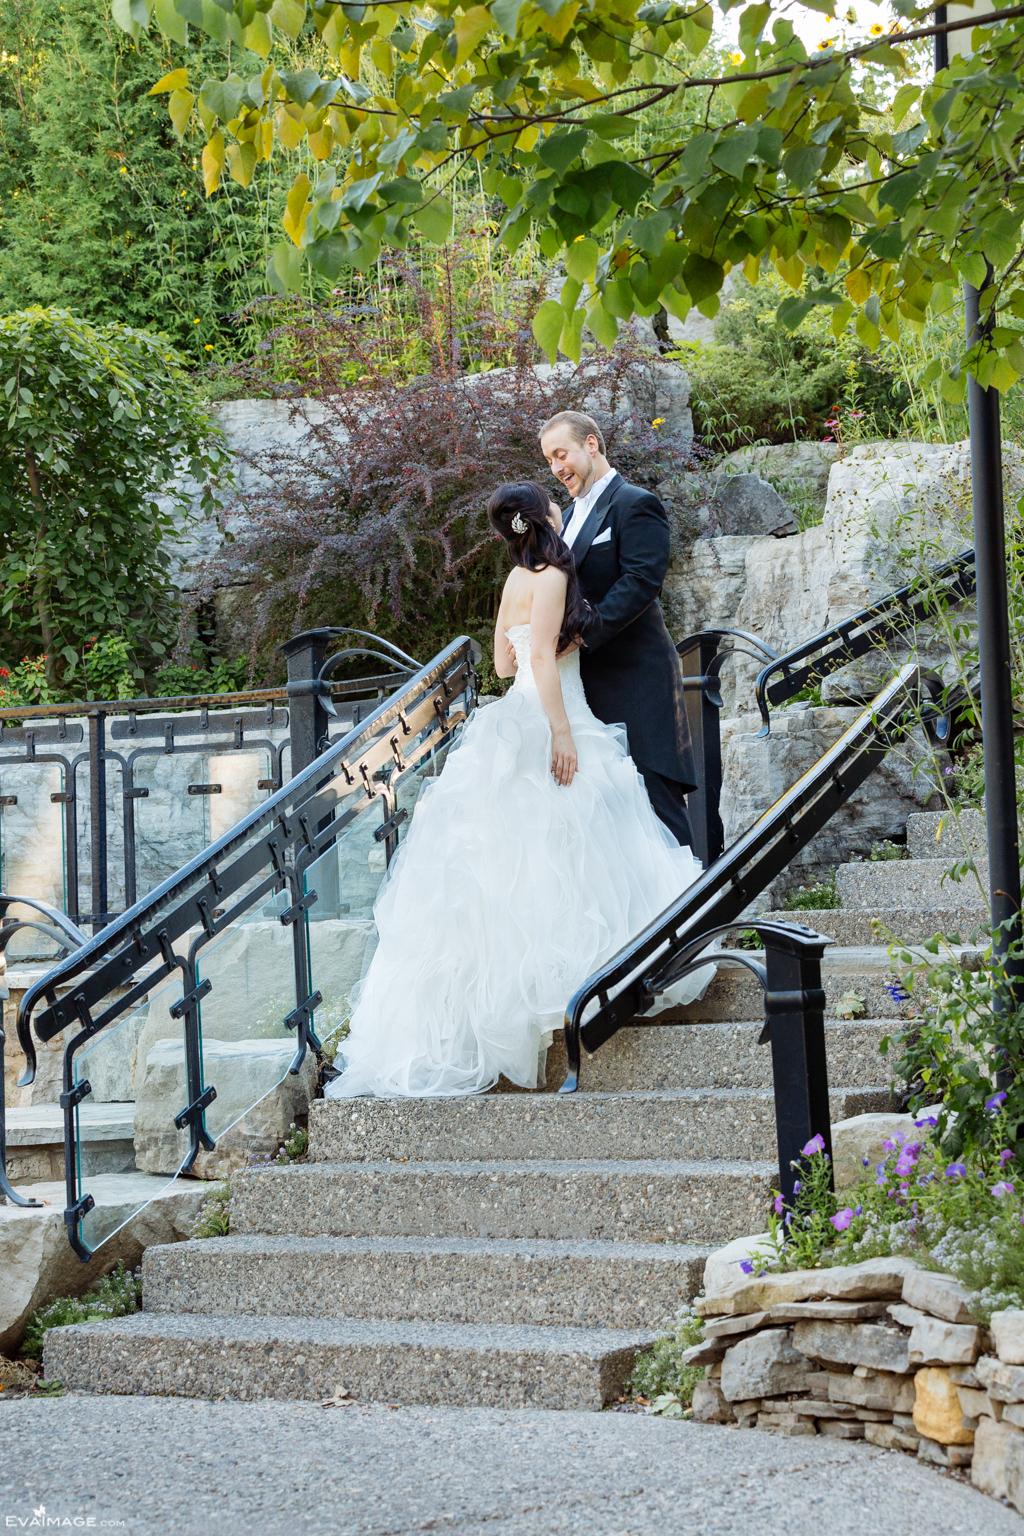 Ancaster_Mill_Wedding_EvaImage-356.jpg